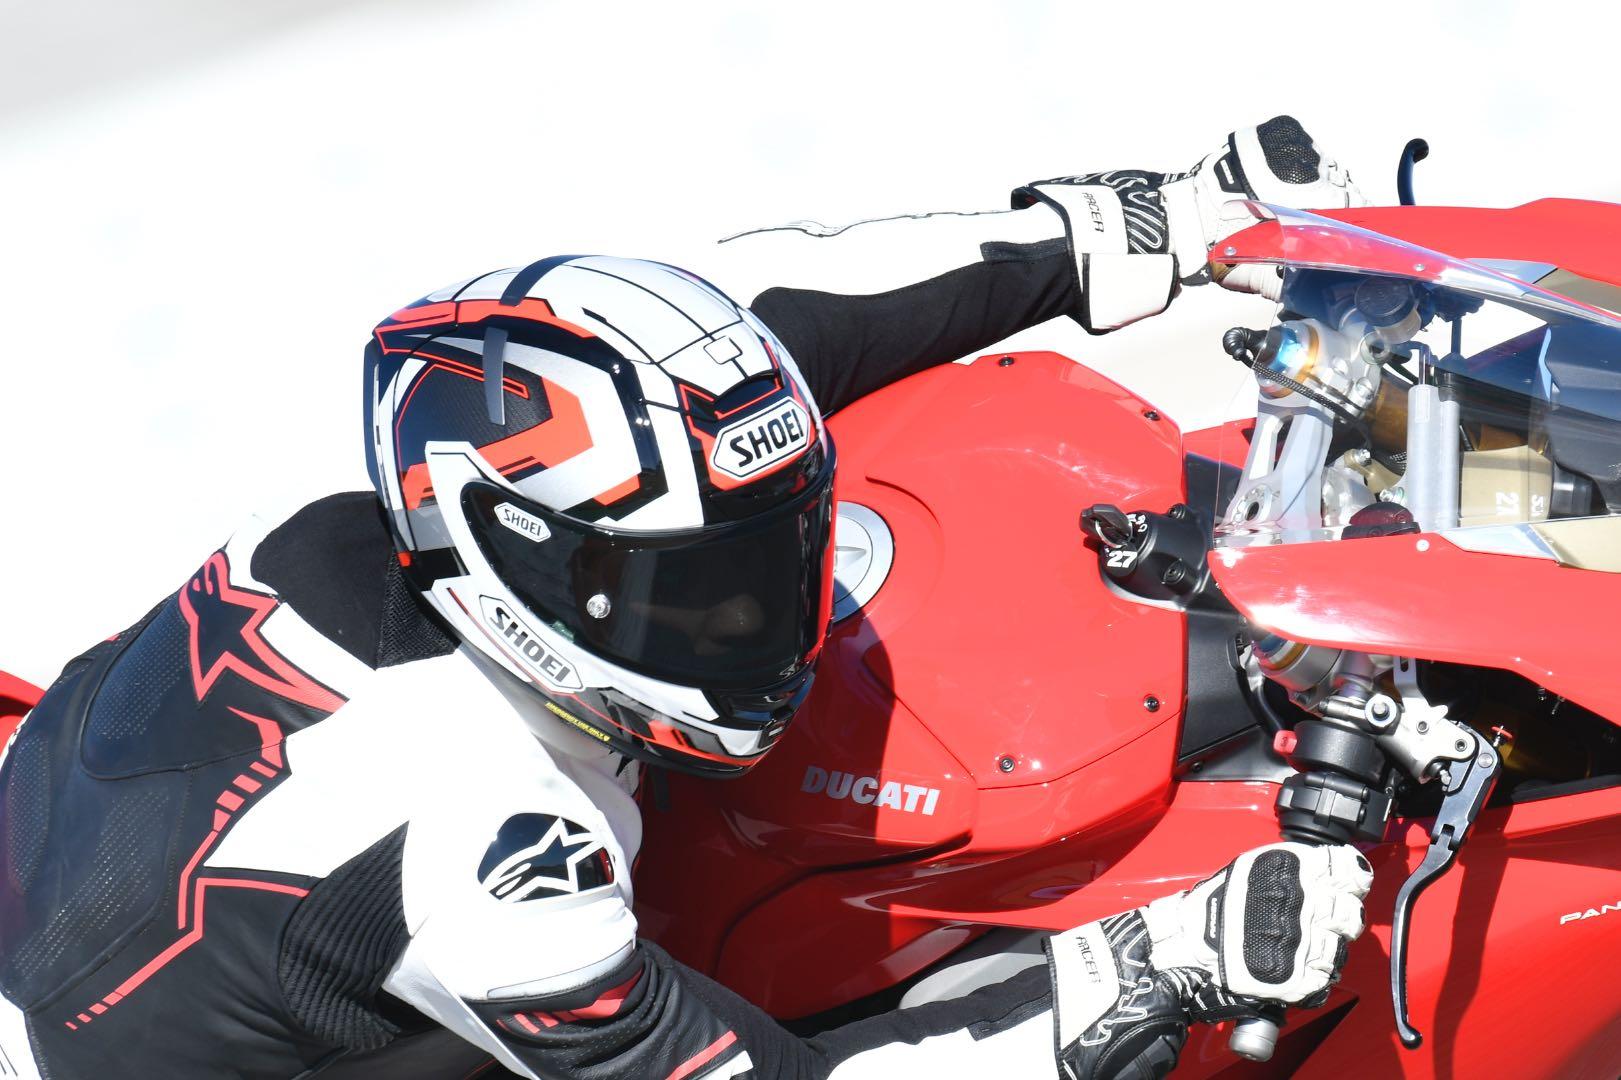 New University Study Debunks Motorcycle Helmet Neck Injury Risks